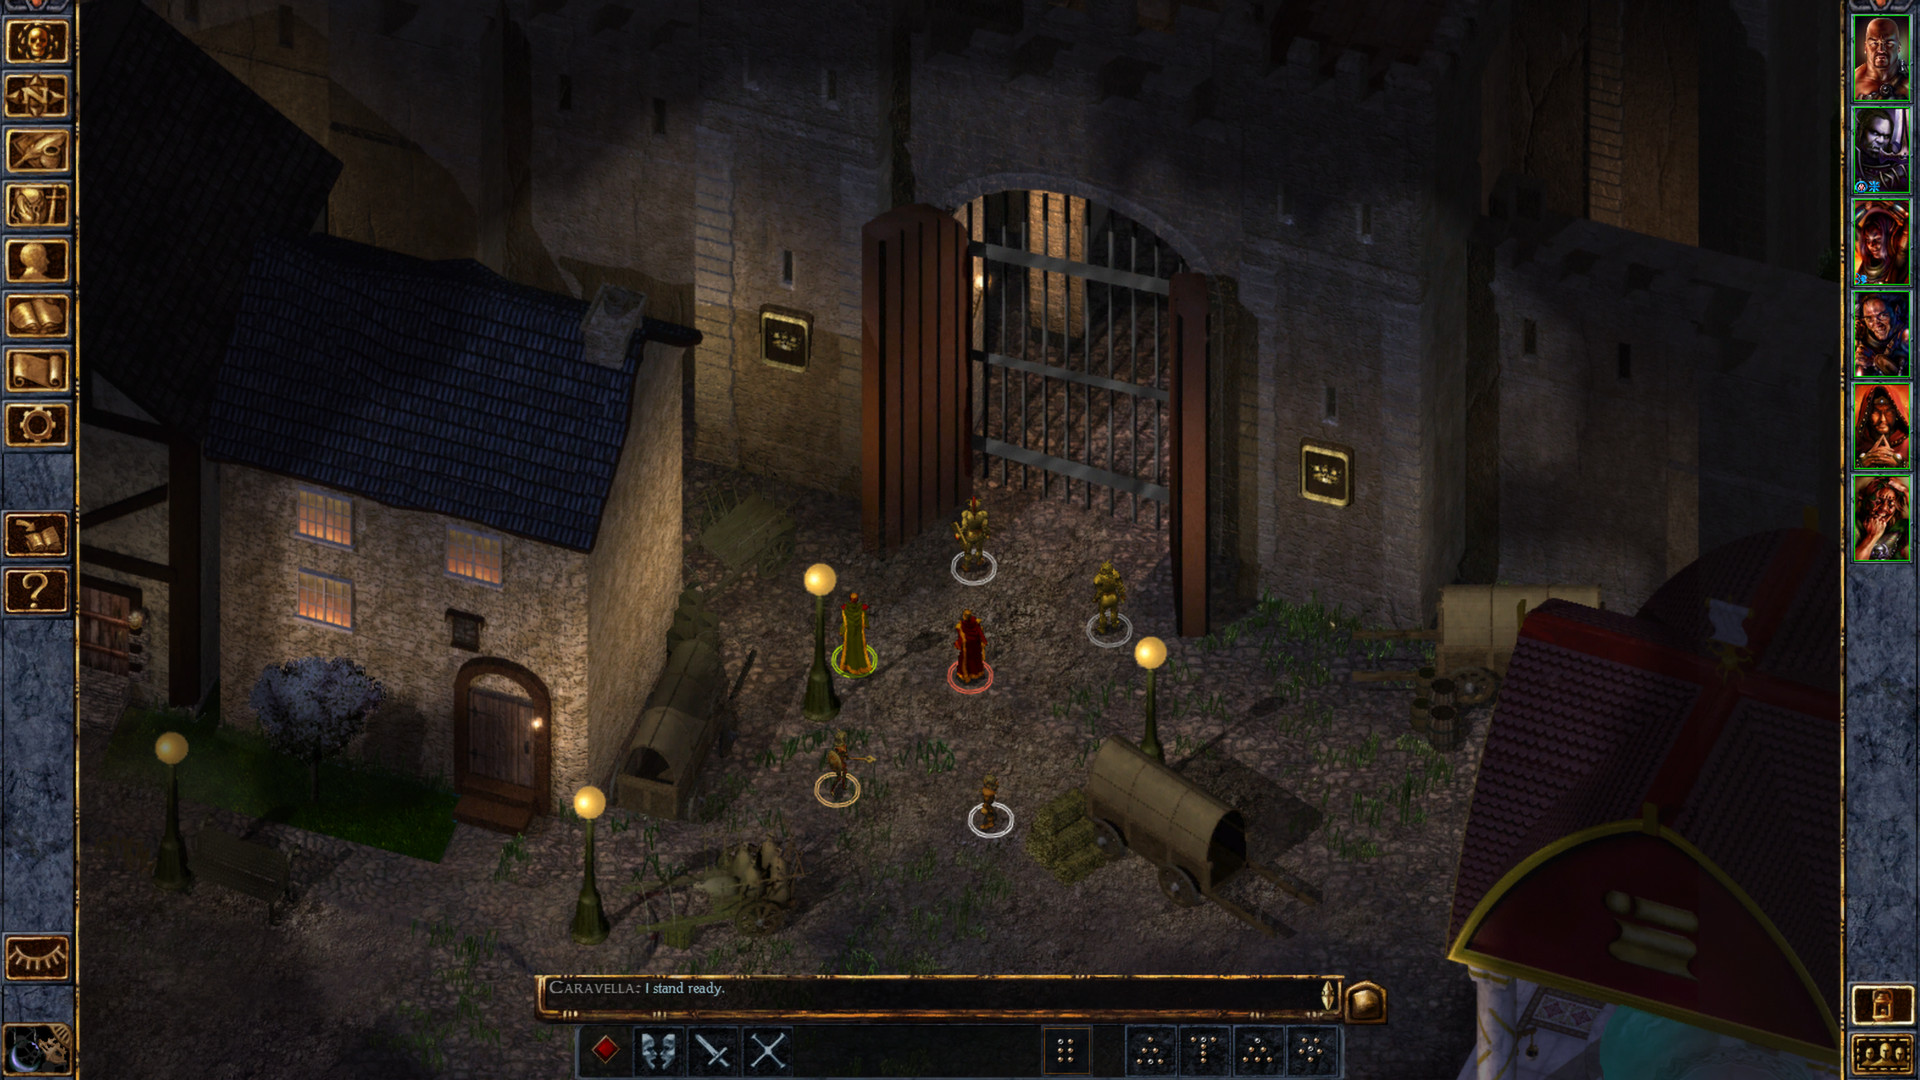 baldurs gate 2 enhanced edition item codes